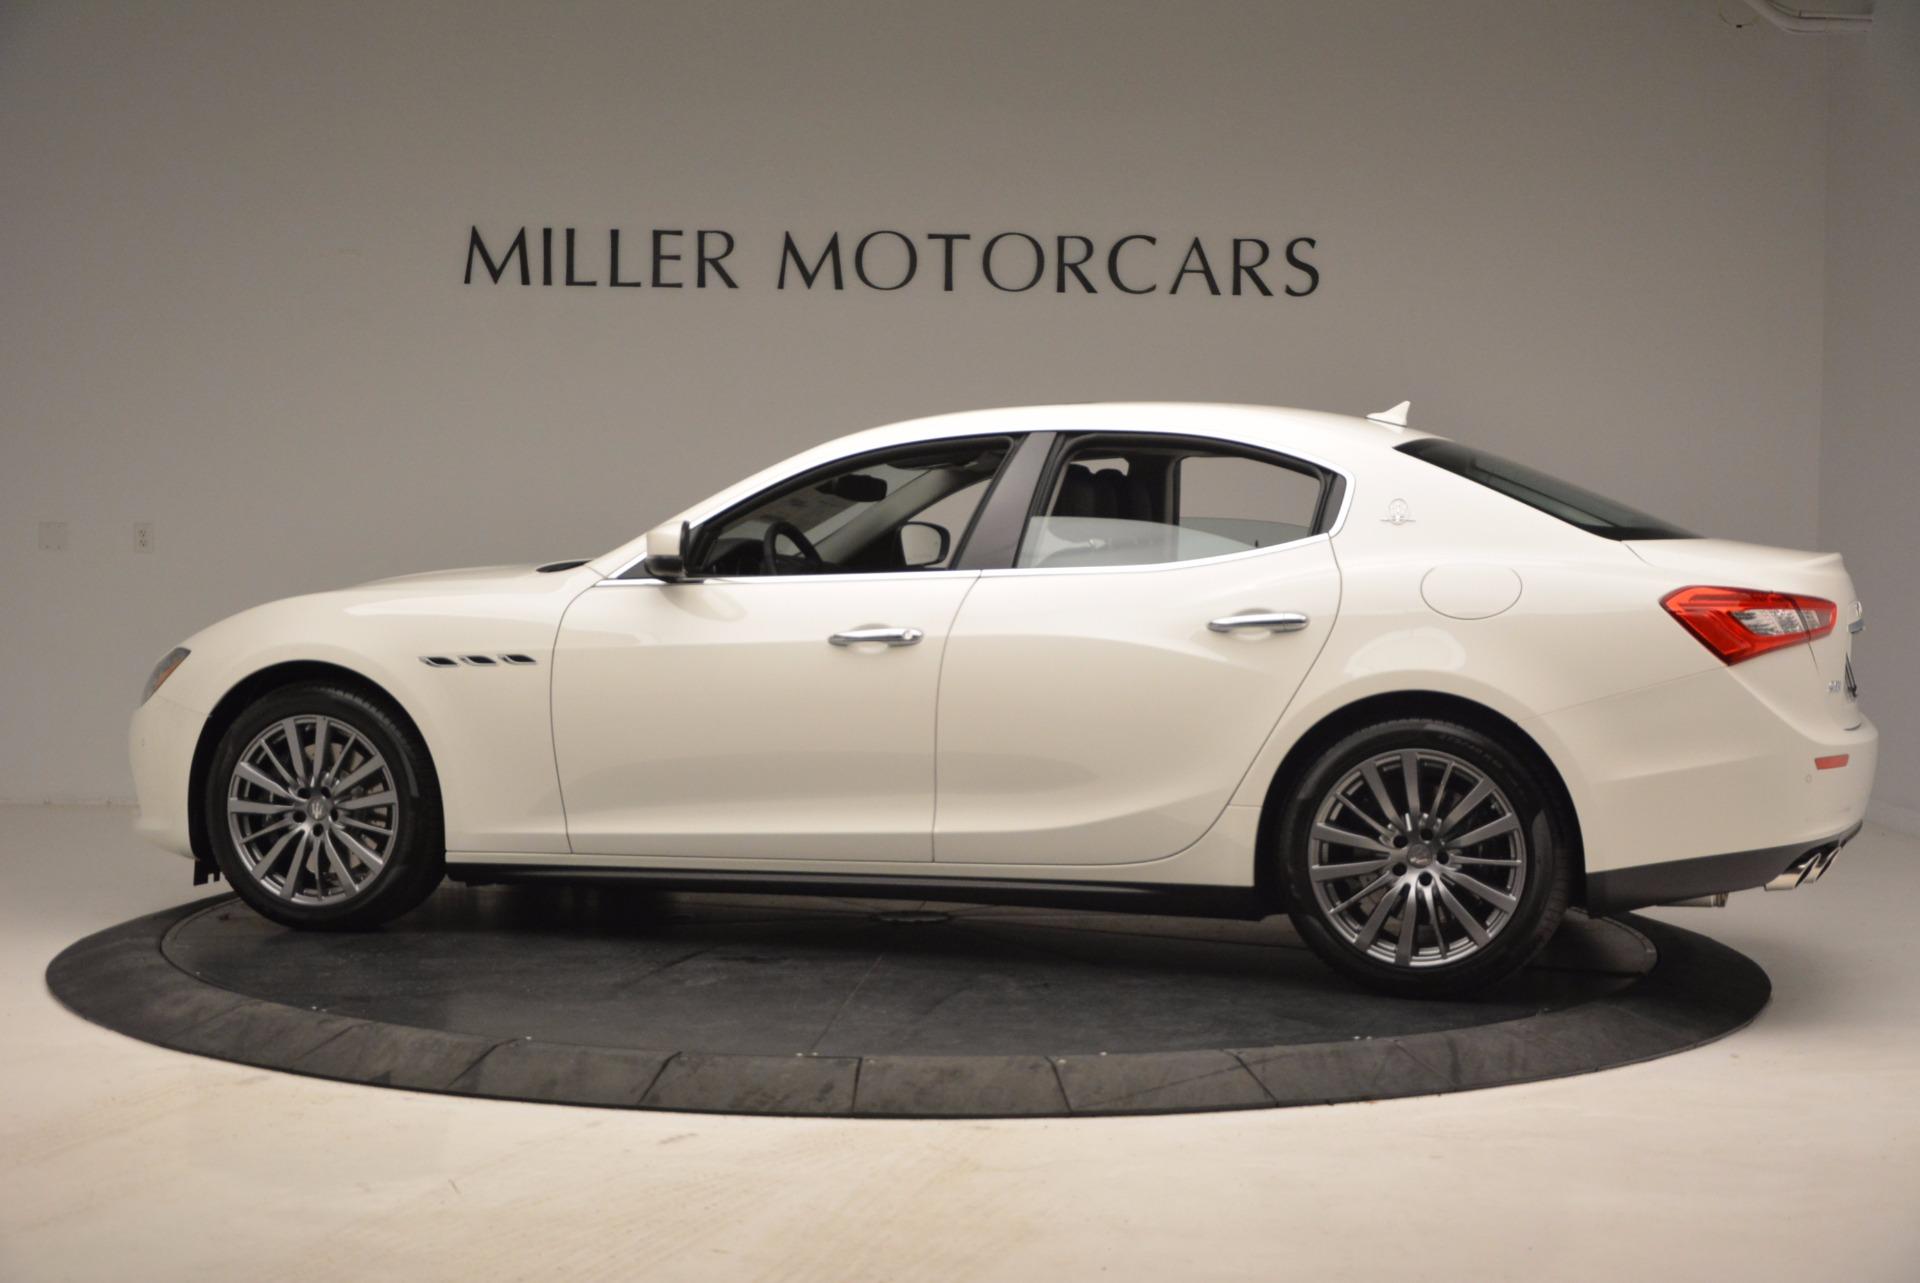 New 2017 Maserati Ghibli S Q4 EX-Loaner For Sale In Greenwich, CT 1031_p4